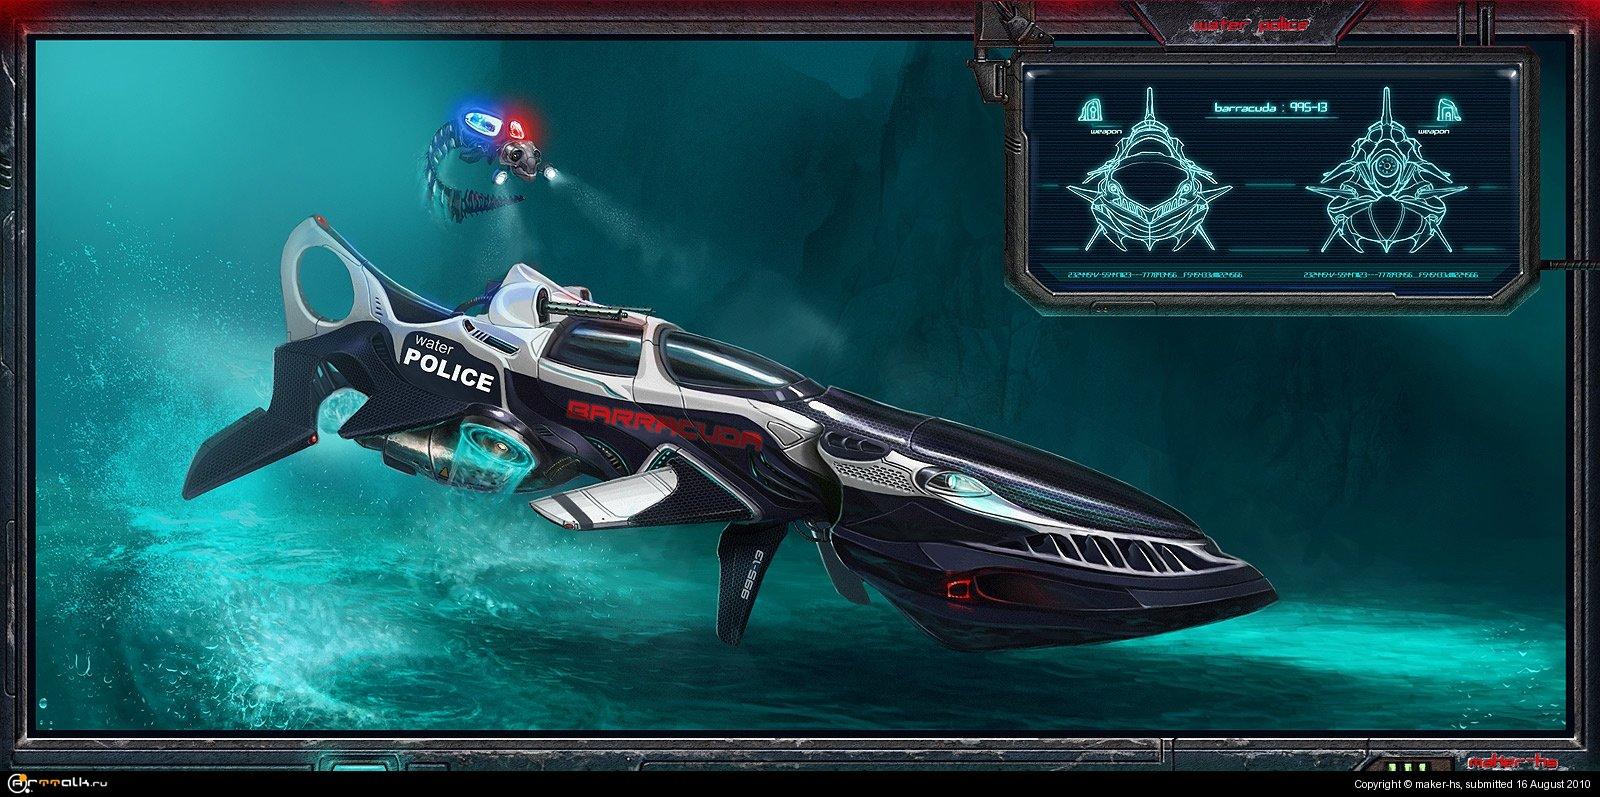 Water Police Barracuda